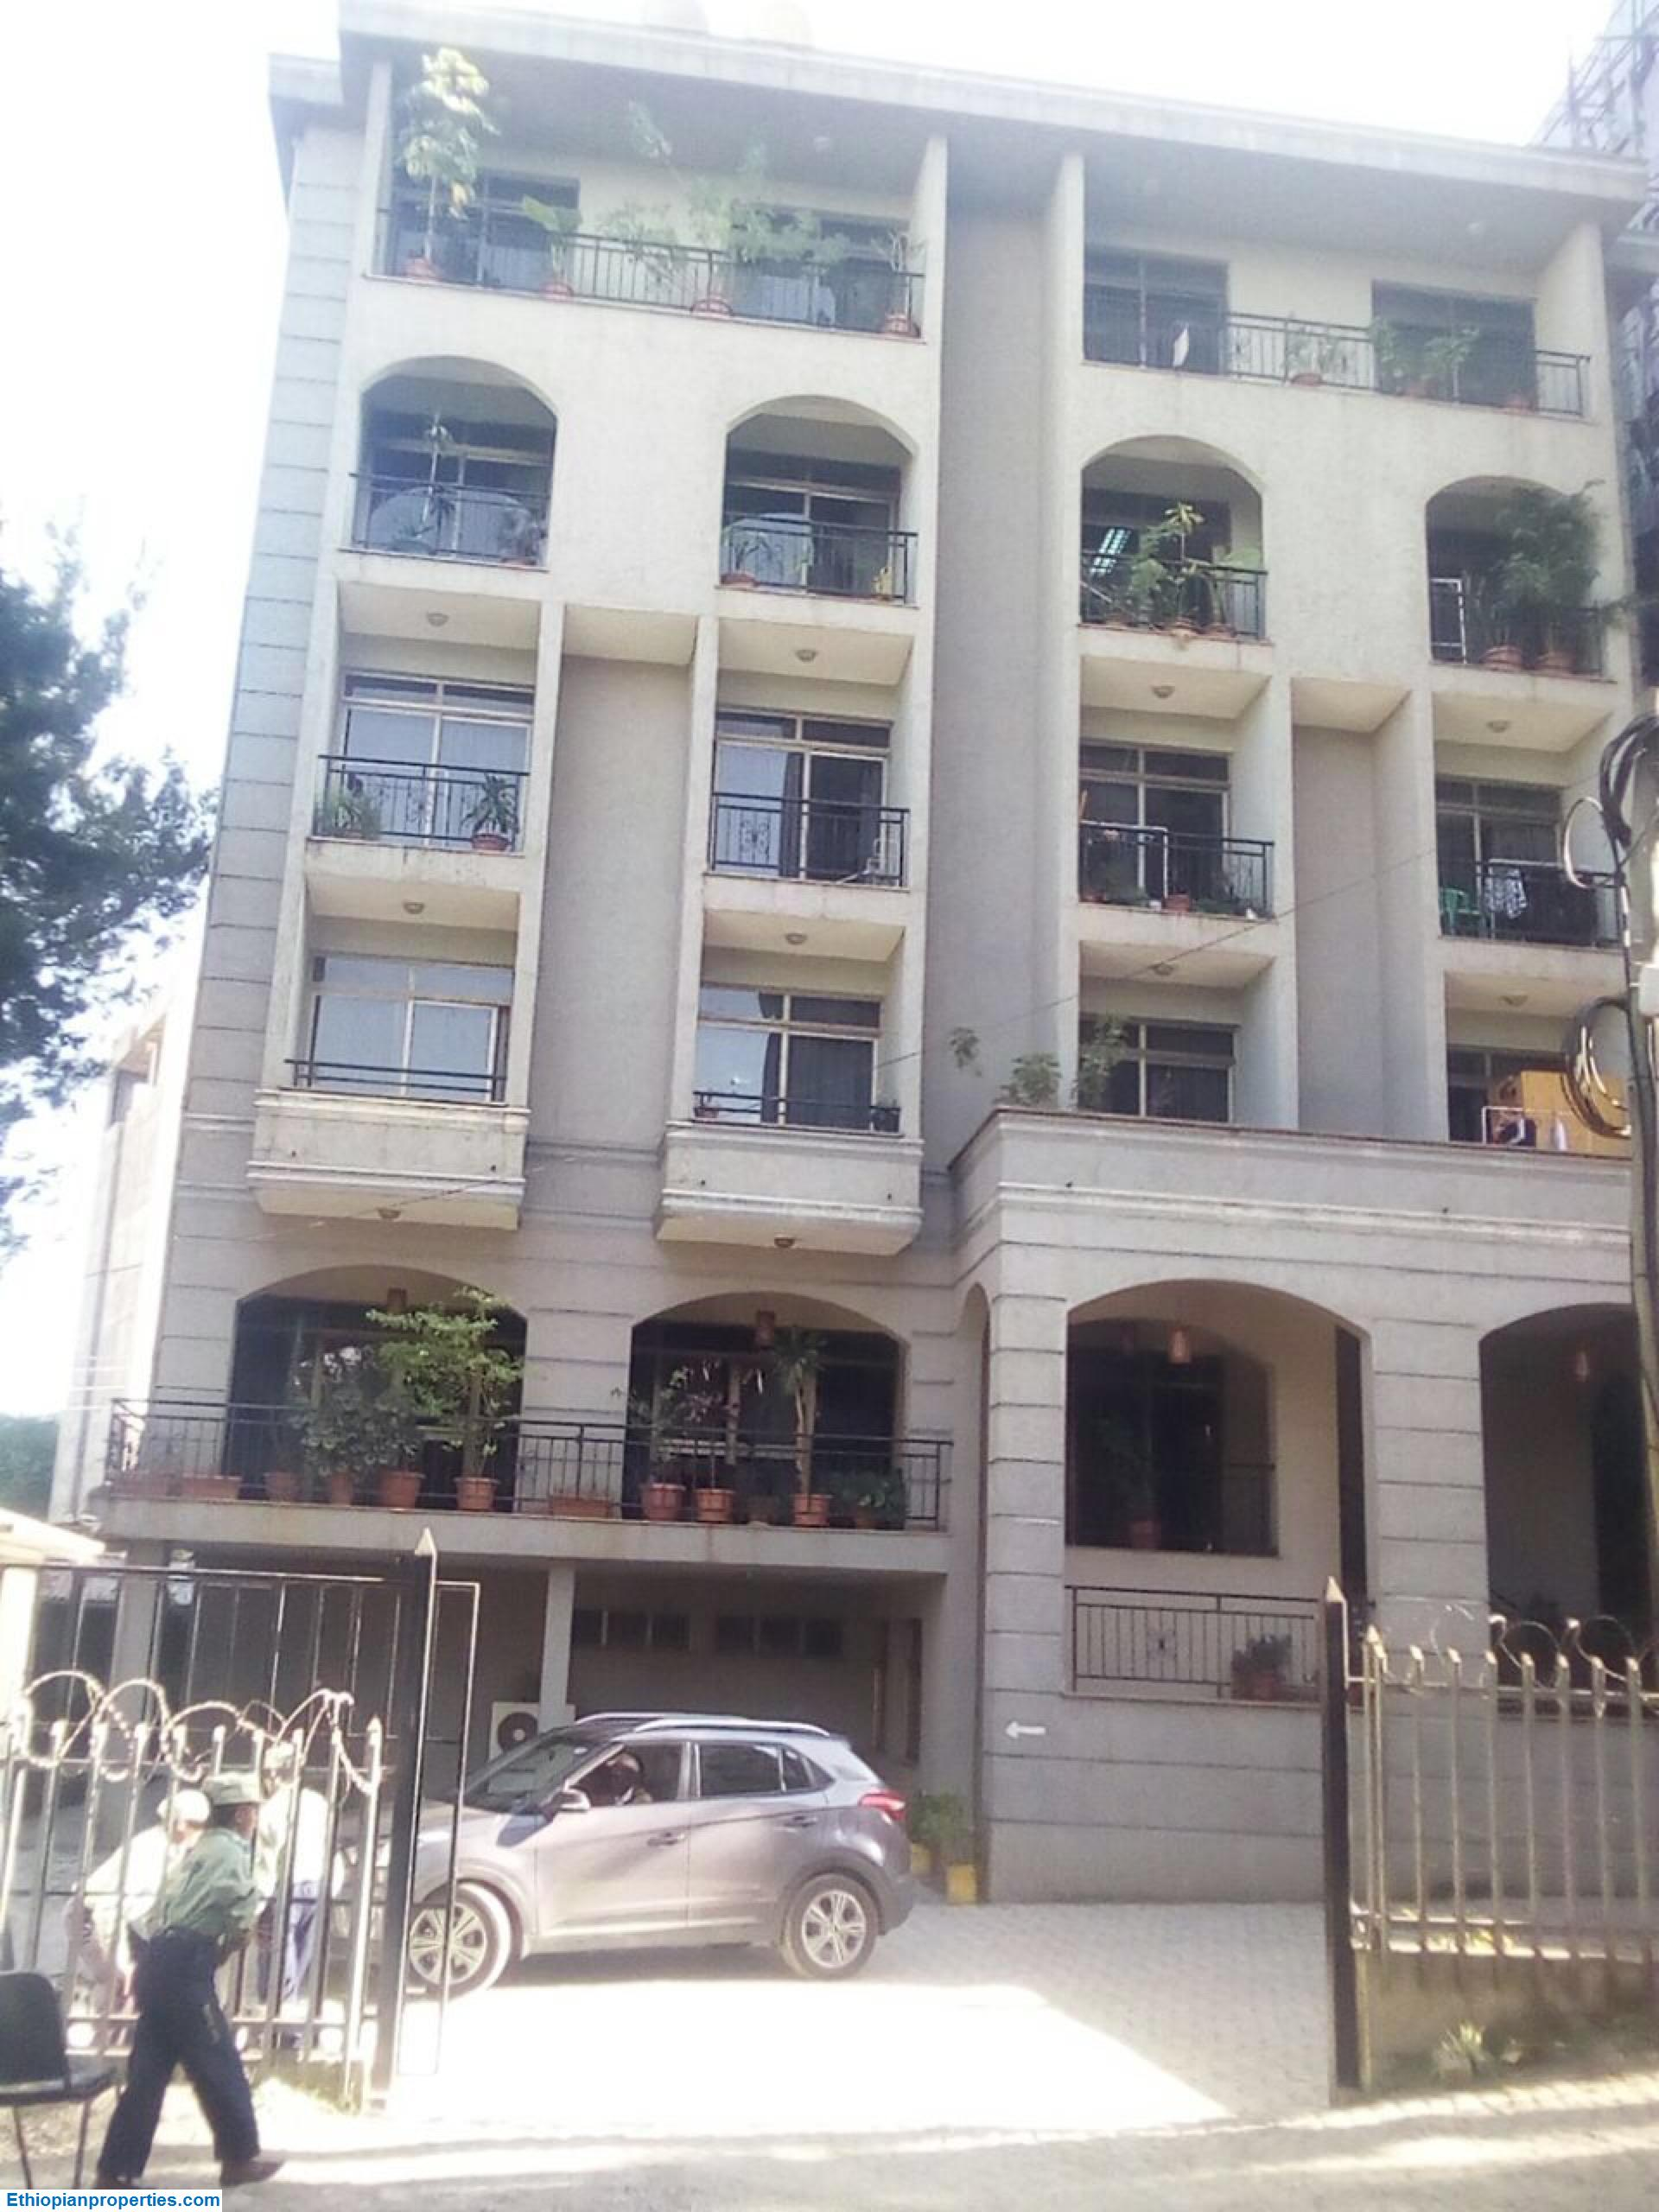 Great Apartment Building for Sale - Ethiopianproperties.com